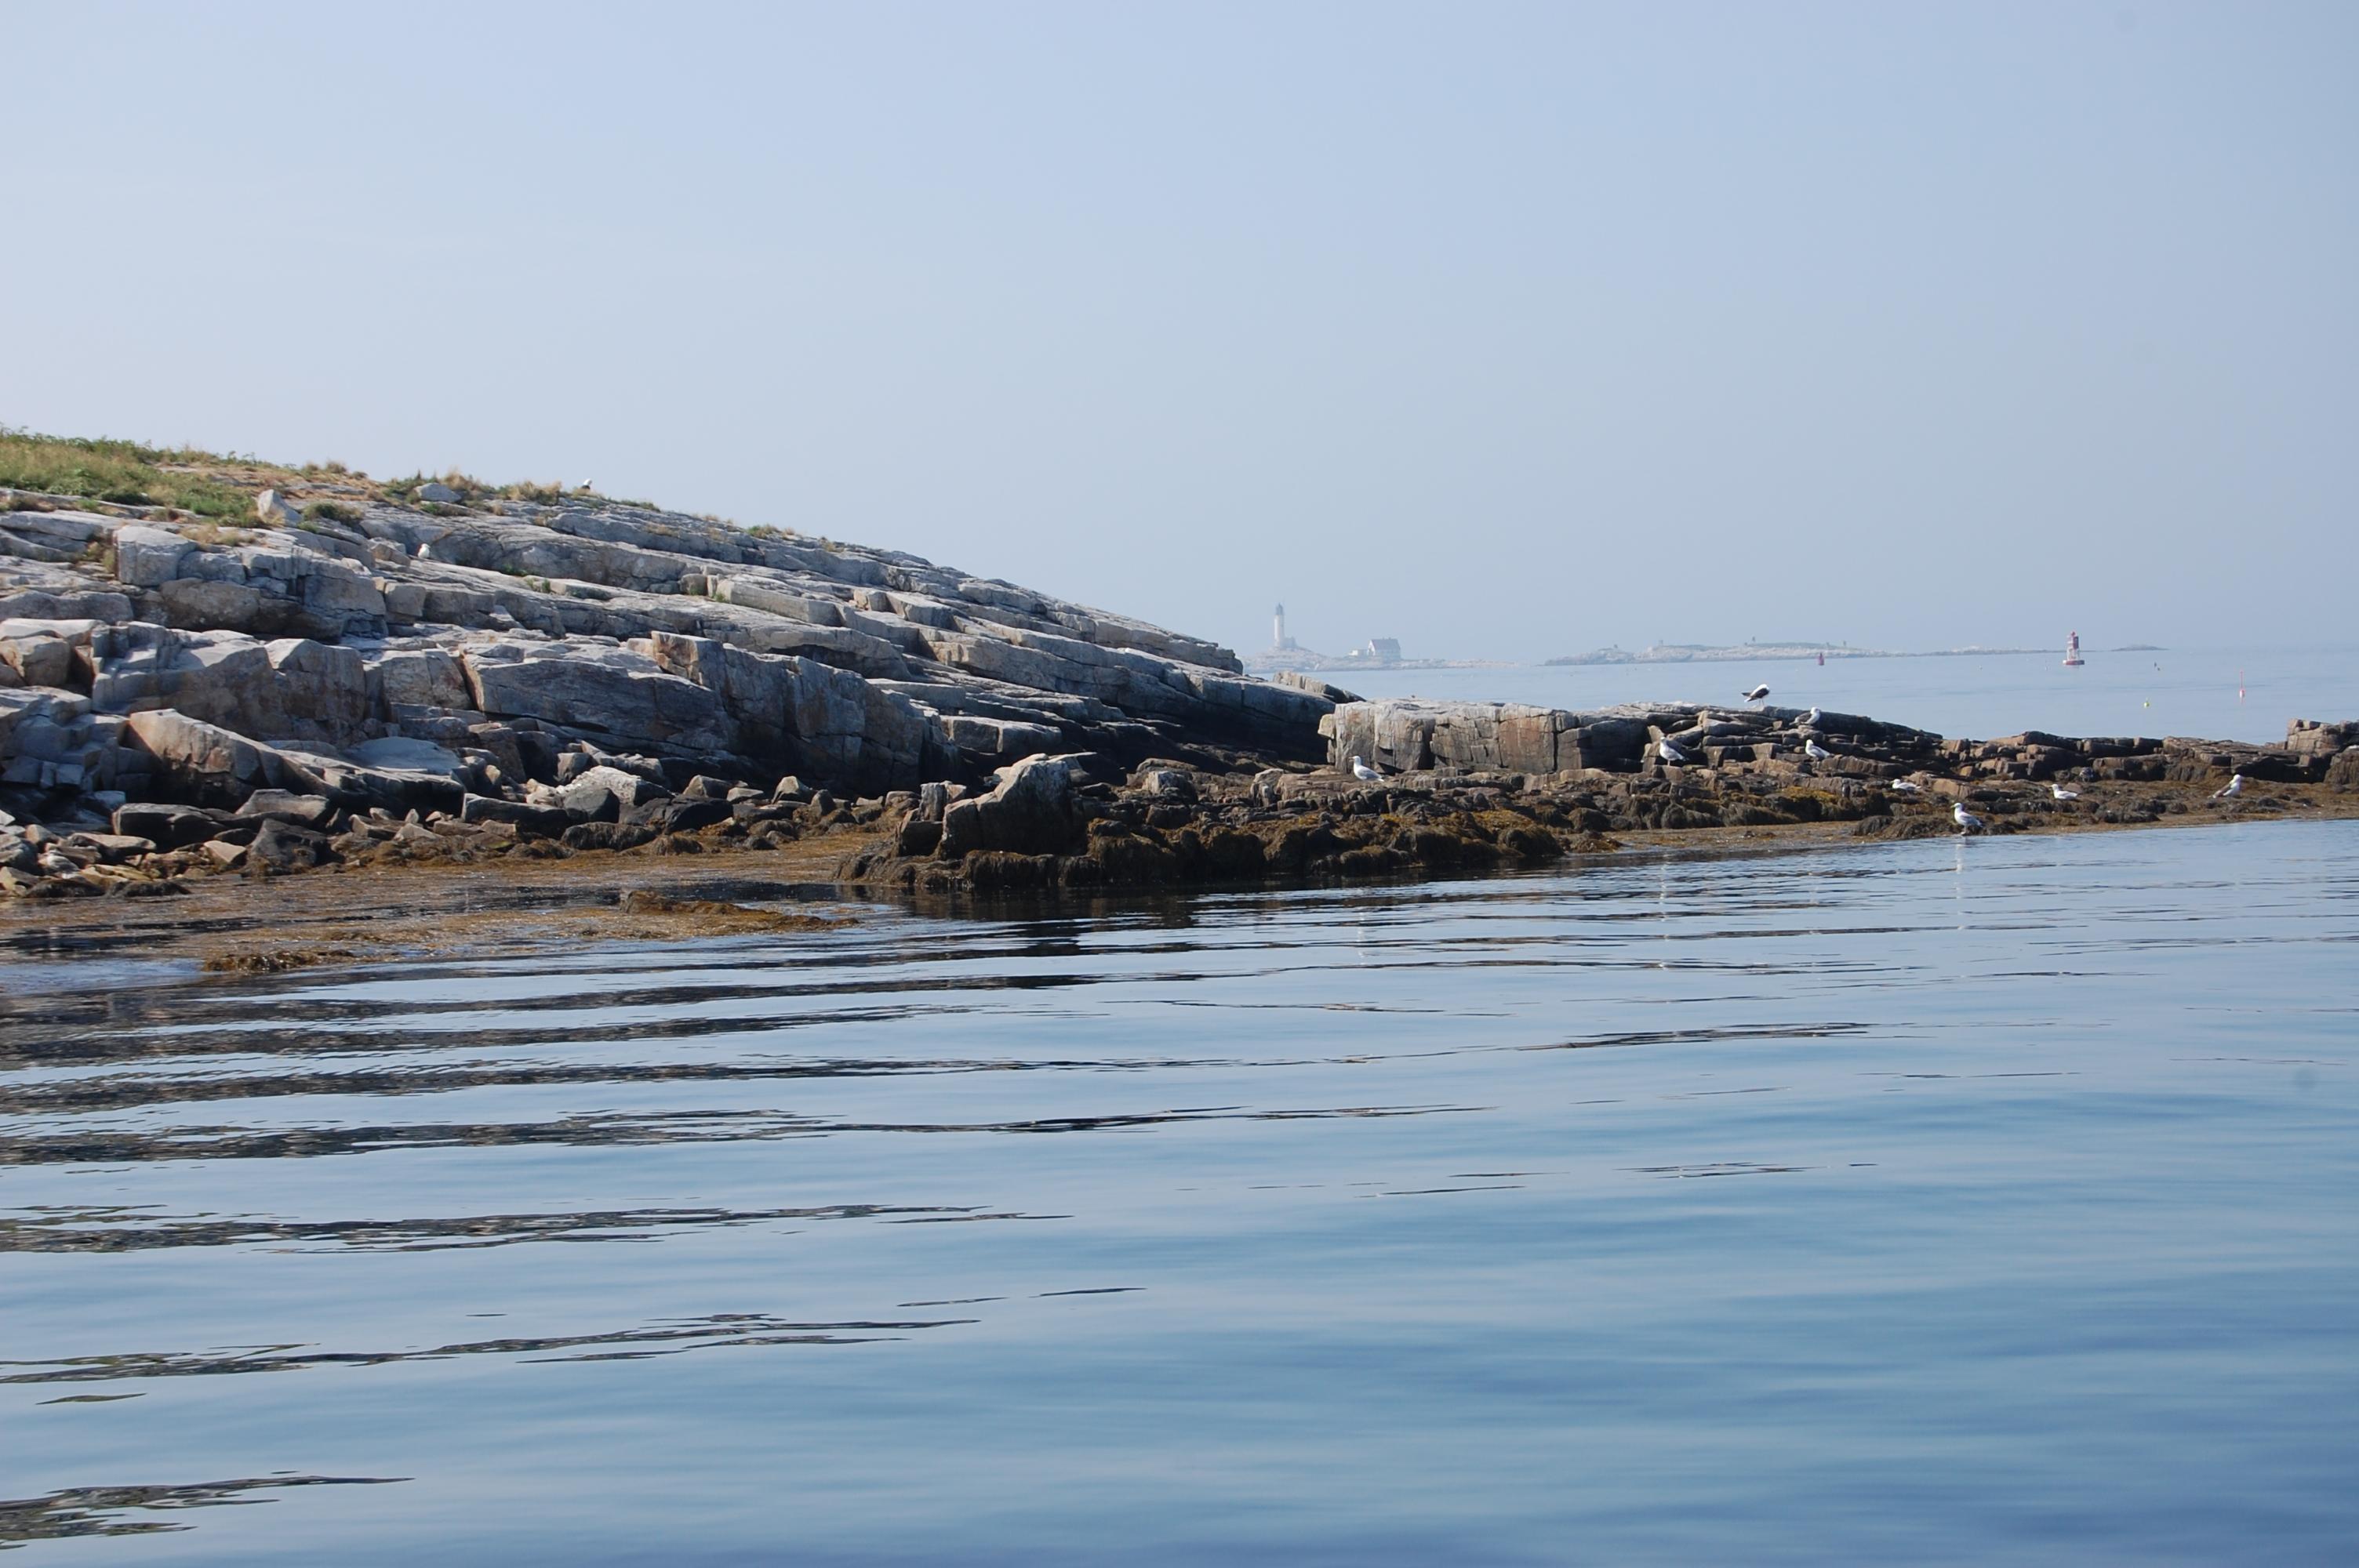 A rocky shoreline on a hazy summer day with calm seas.